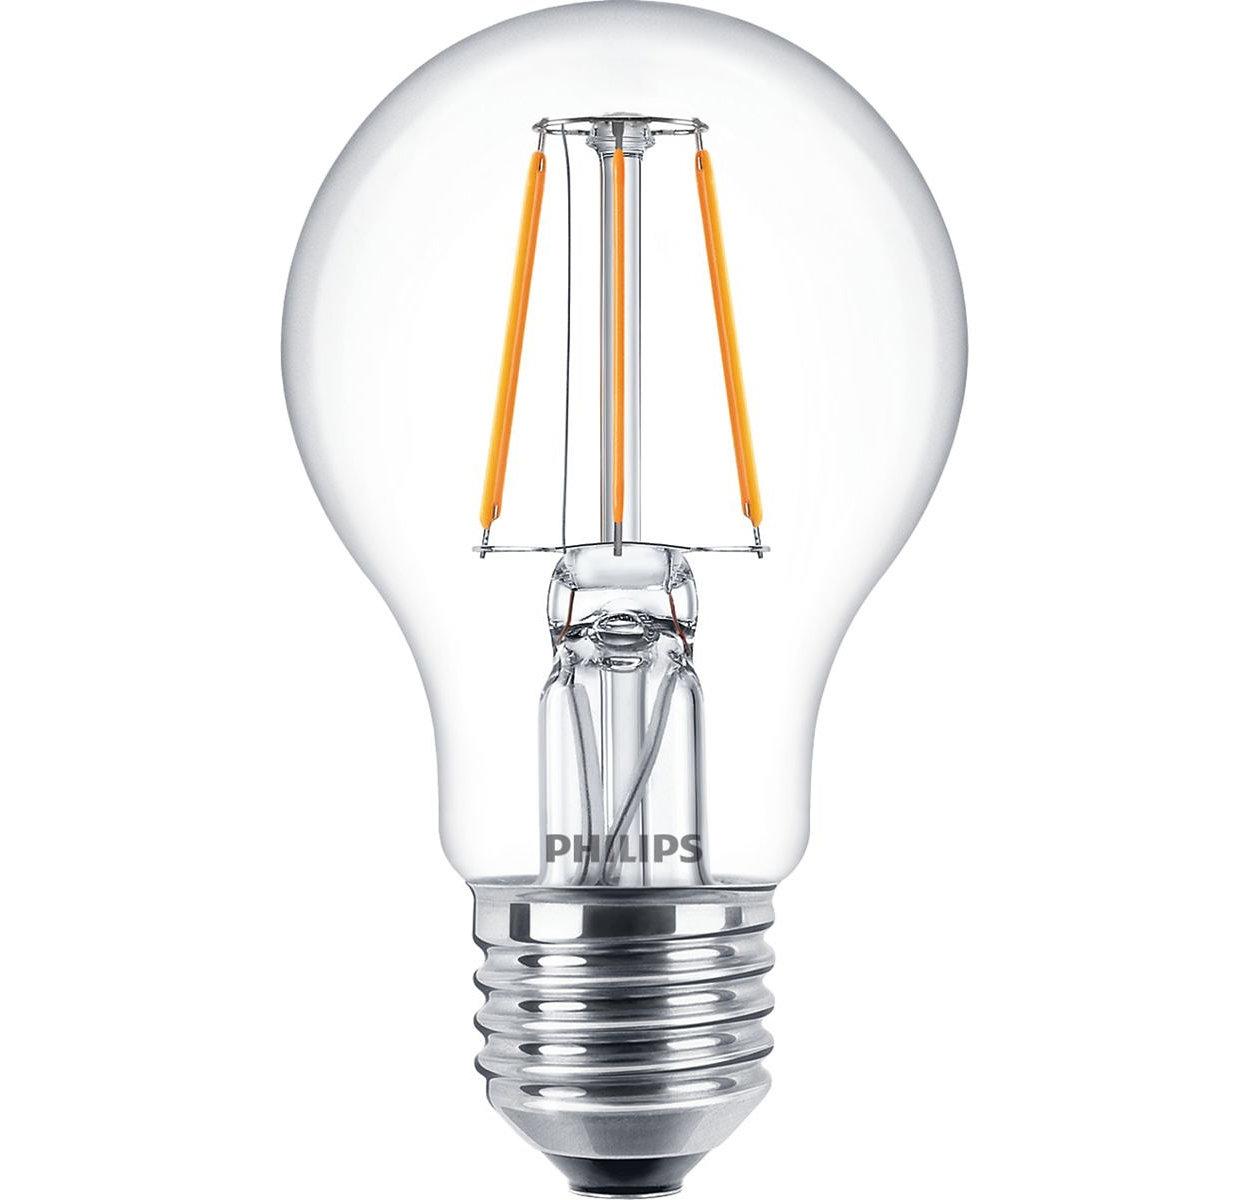 Lampade Classic LEDbulbs per illuminazioni decorative